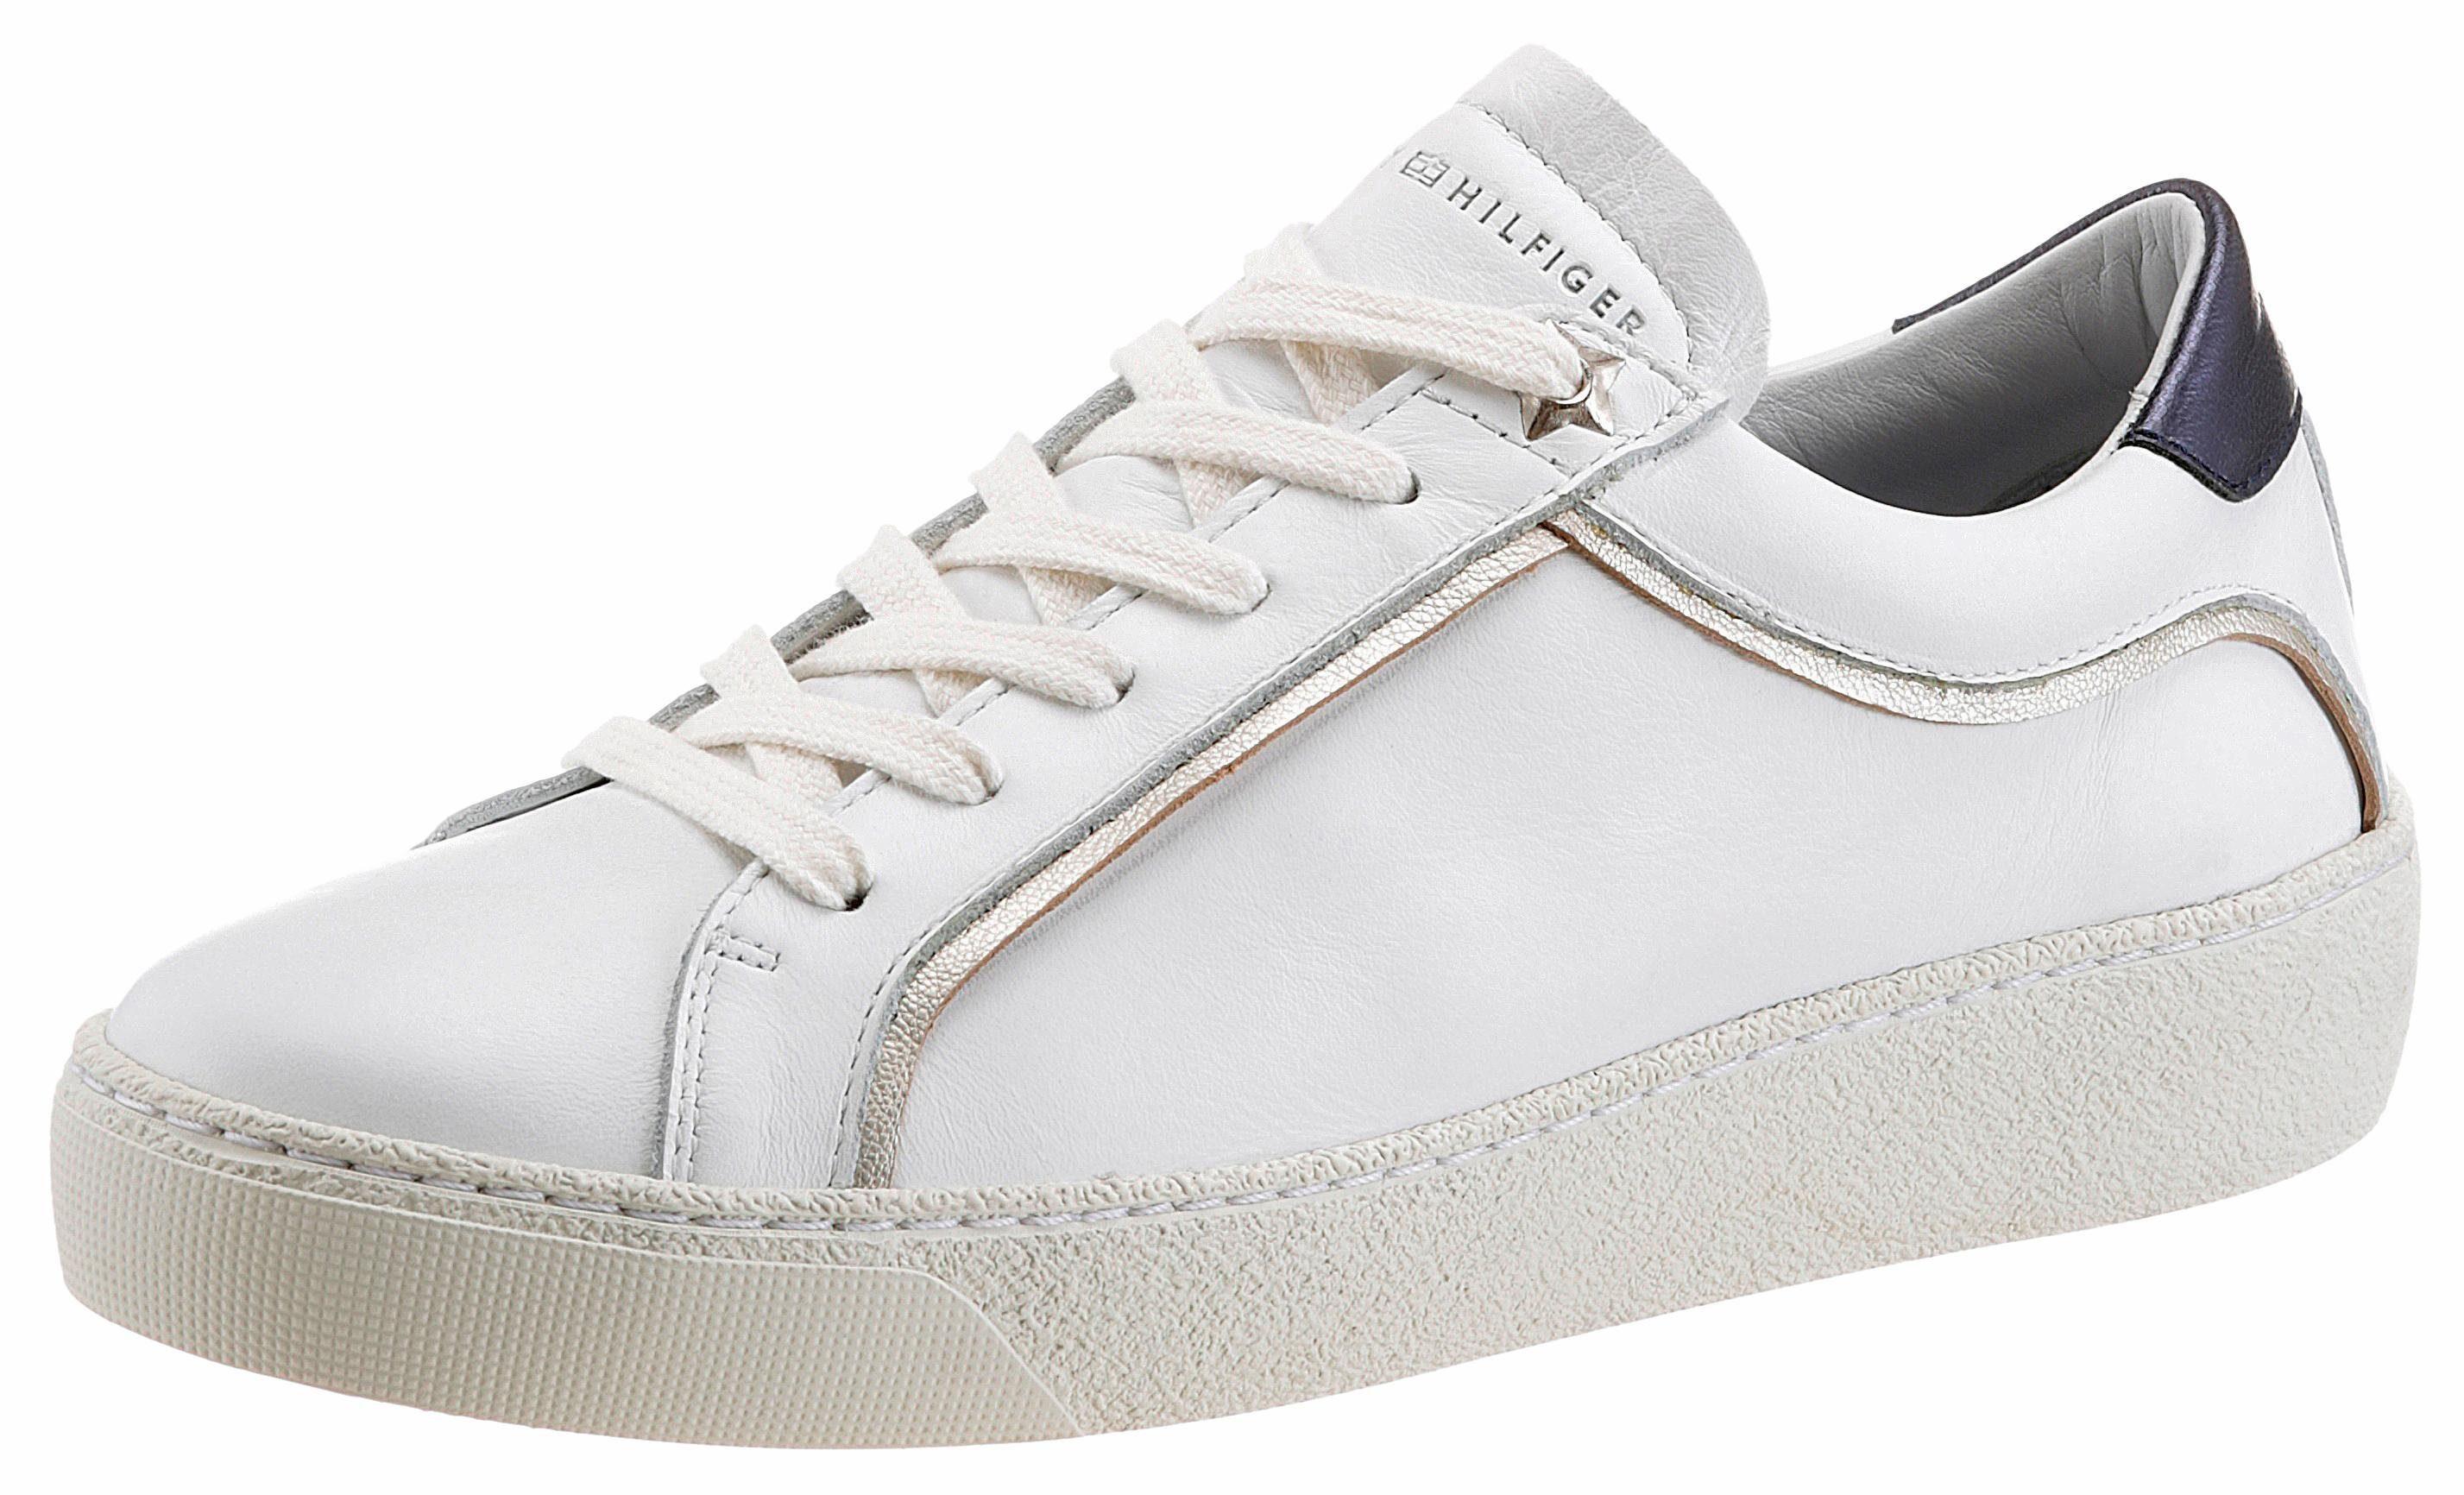 Tommy Hilfiger Sneaker, mit Metallic-Applikation  weiß